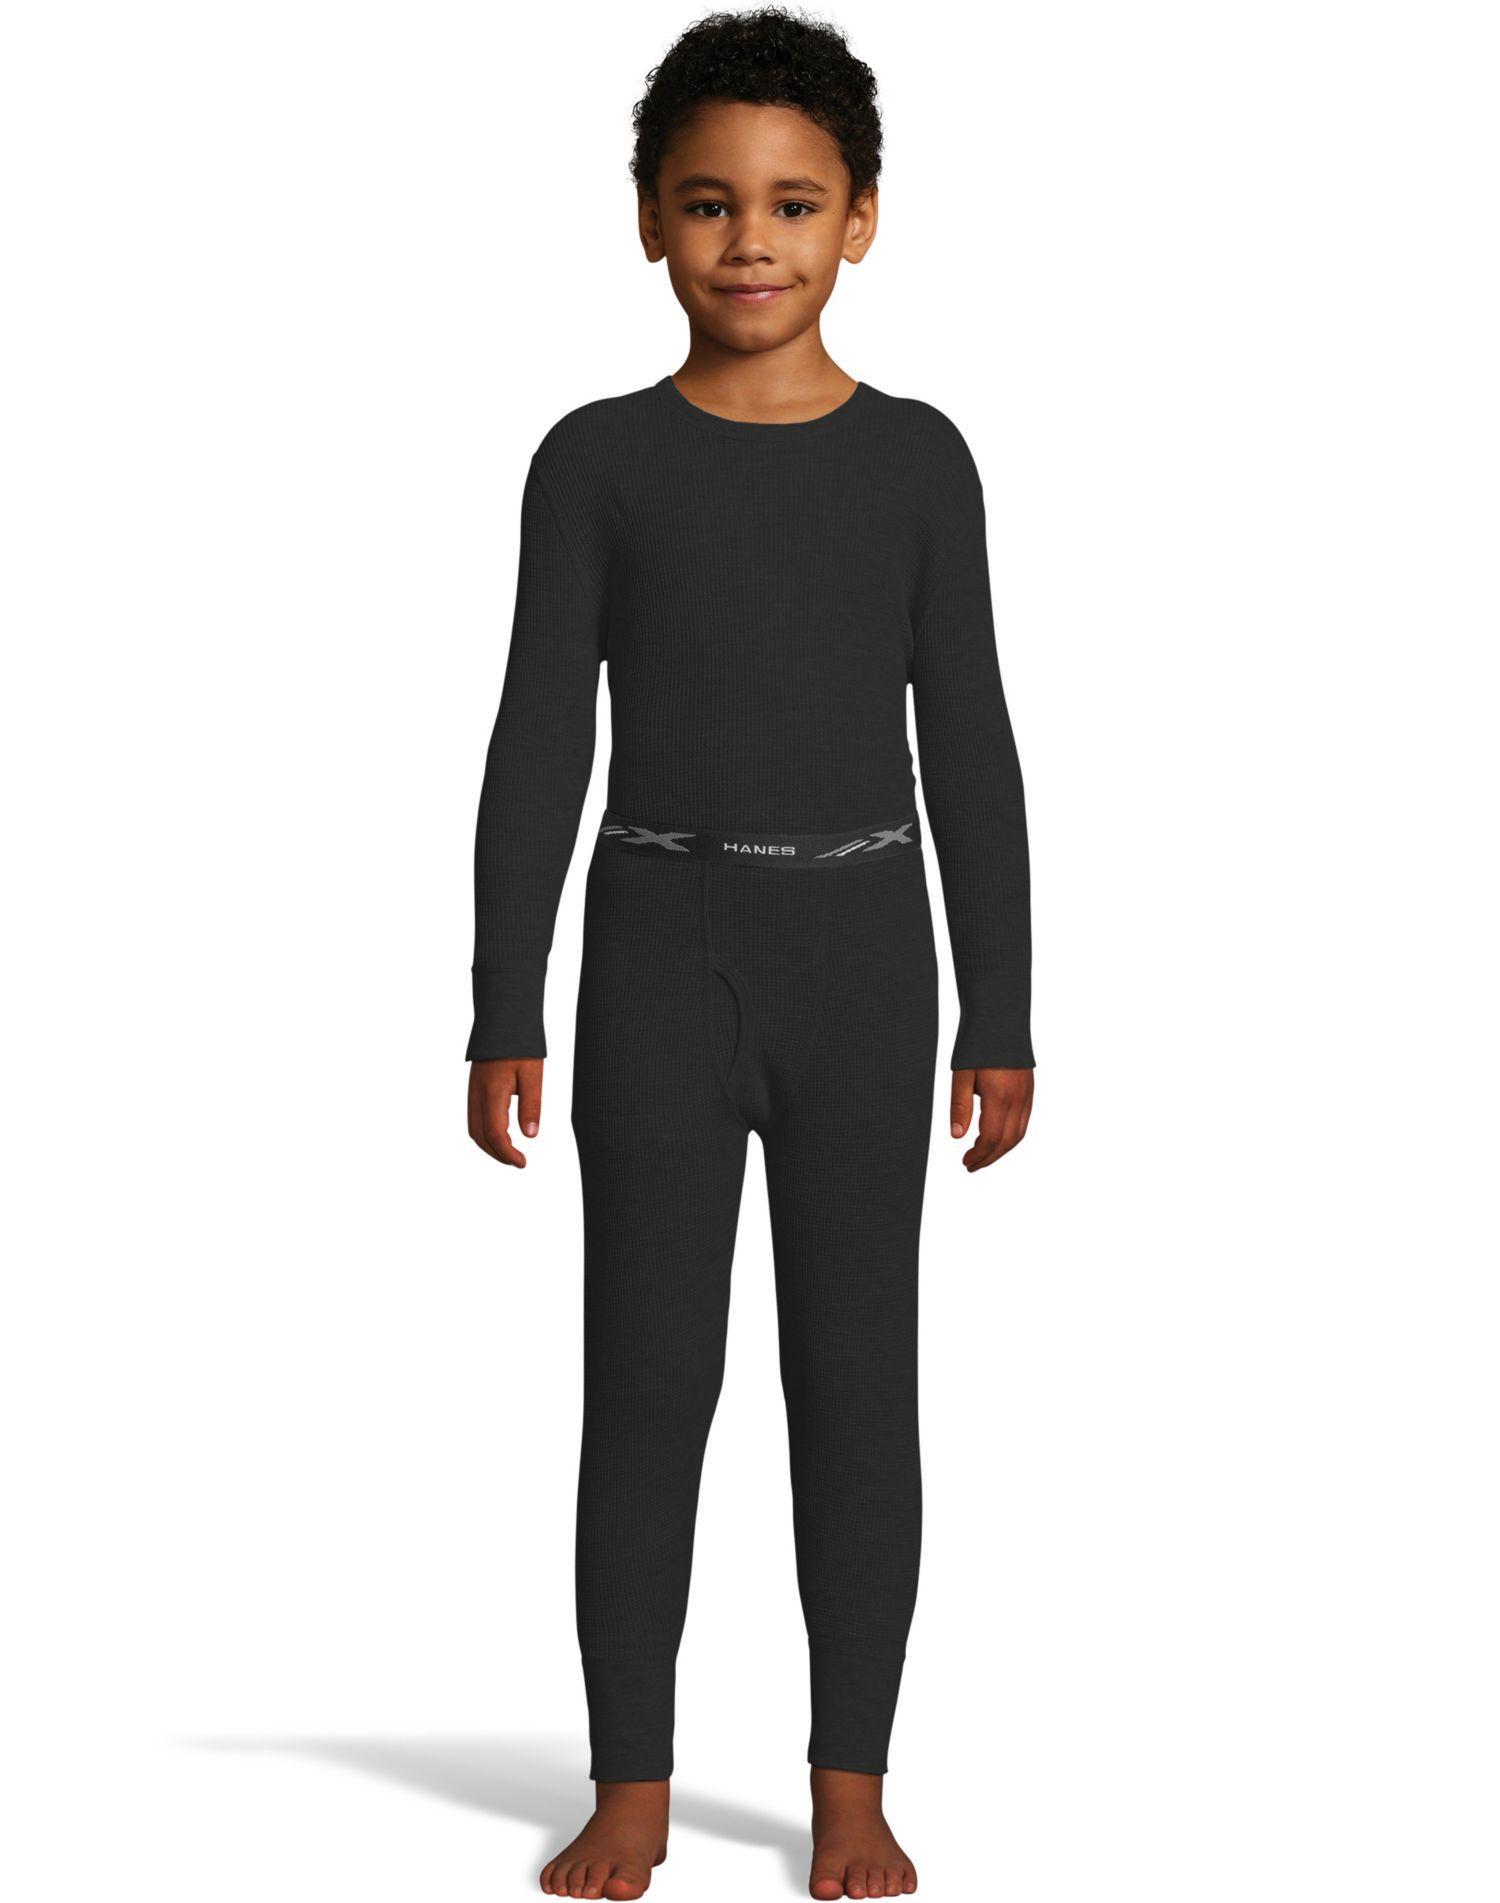 Hanes Boys Waffle Knit Thermal Set, XS, Black